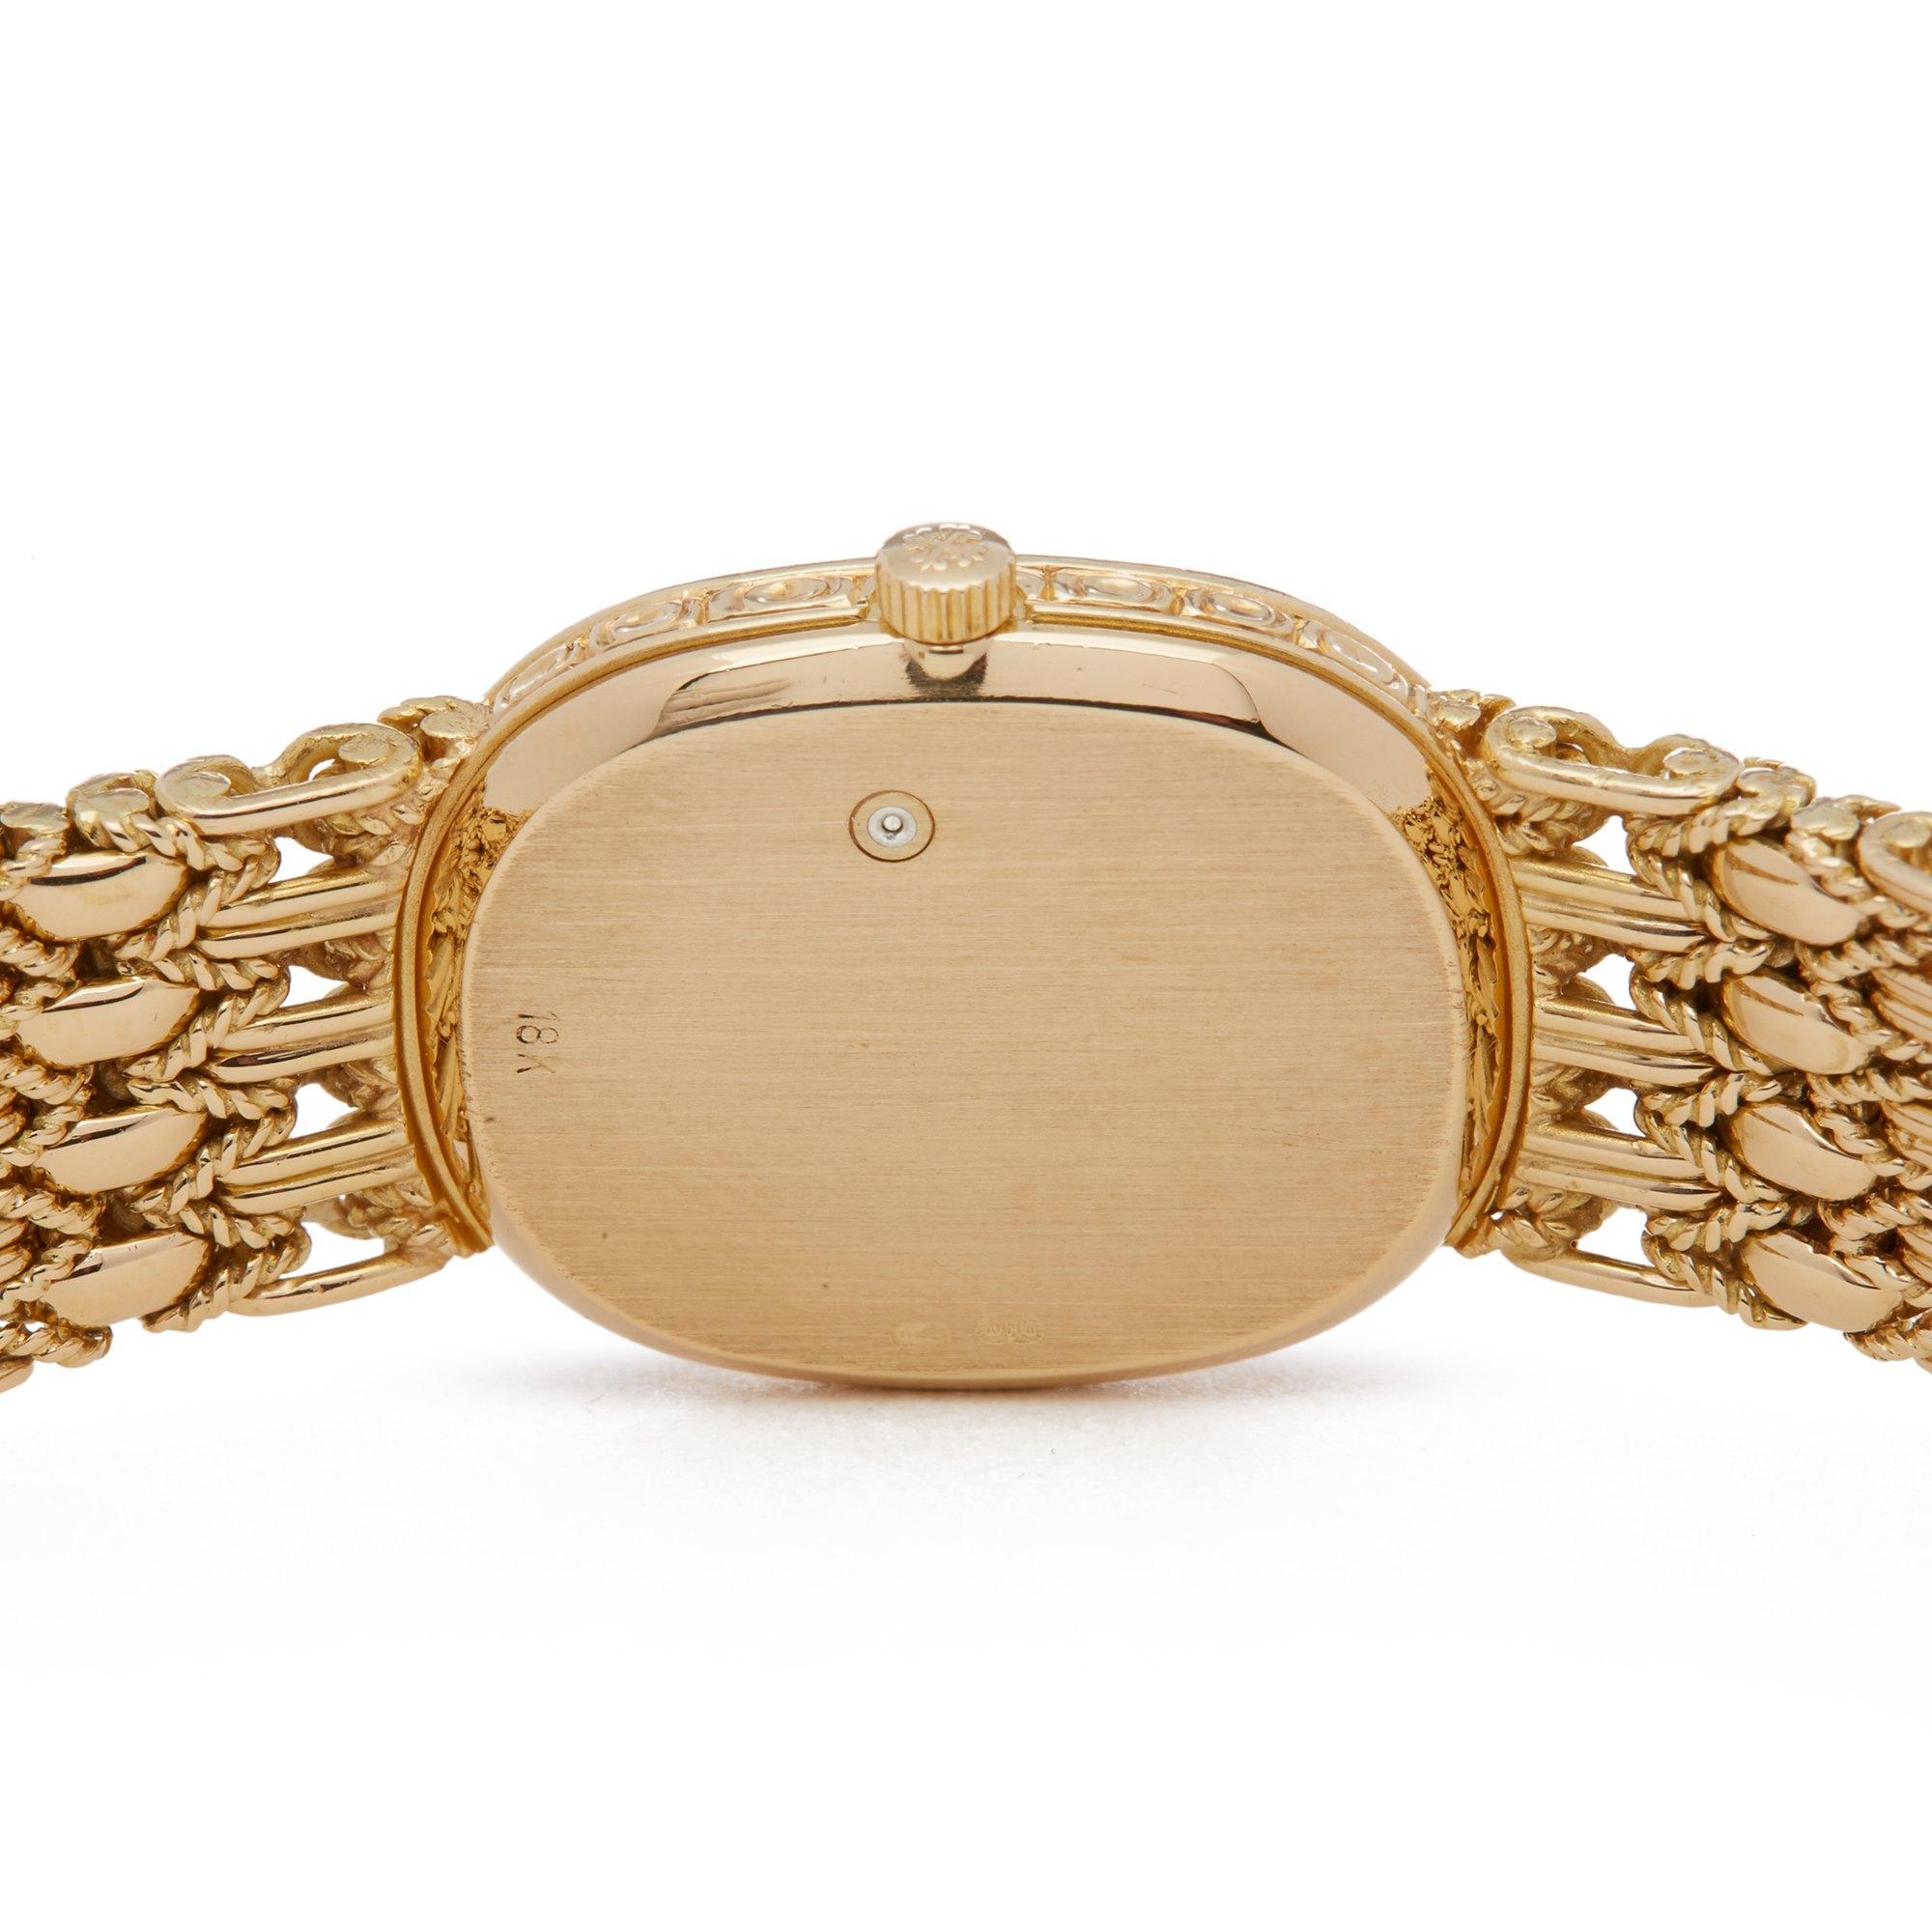 Patek Philippe Ellipse Factory Diamonds 18K Yellow Gold 4698